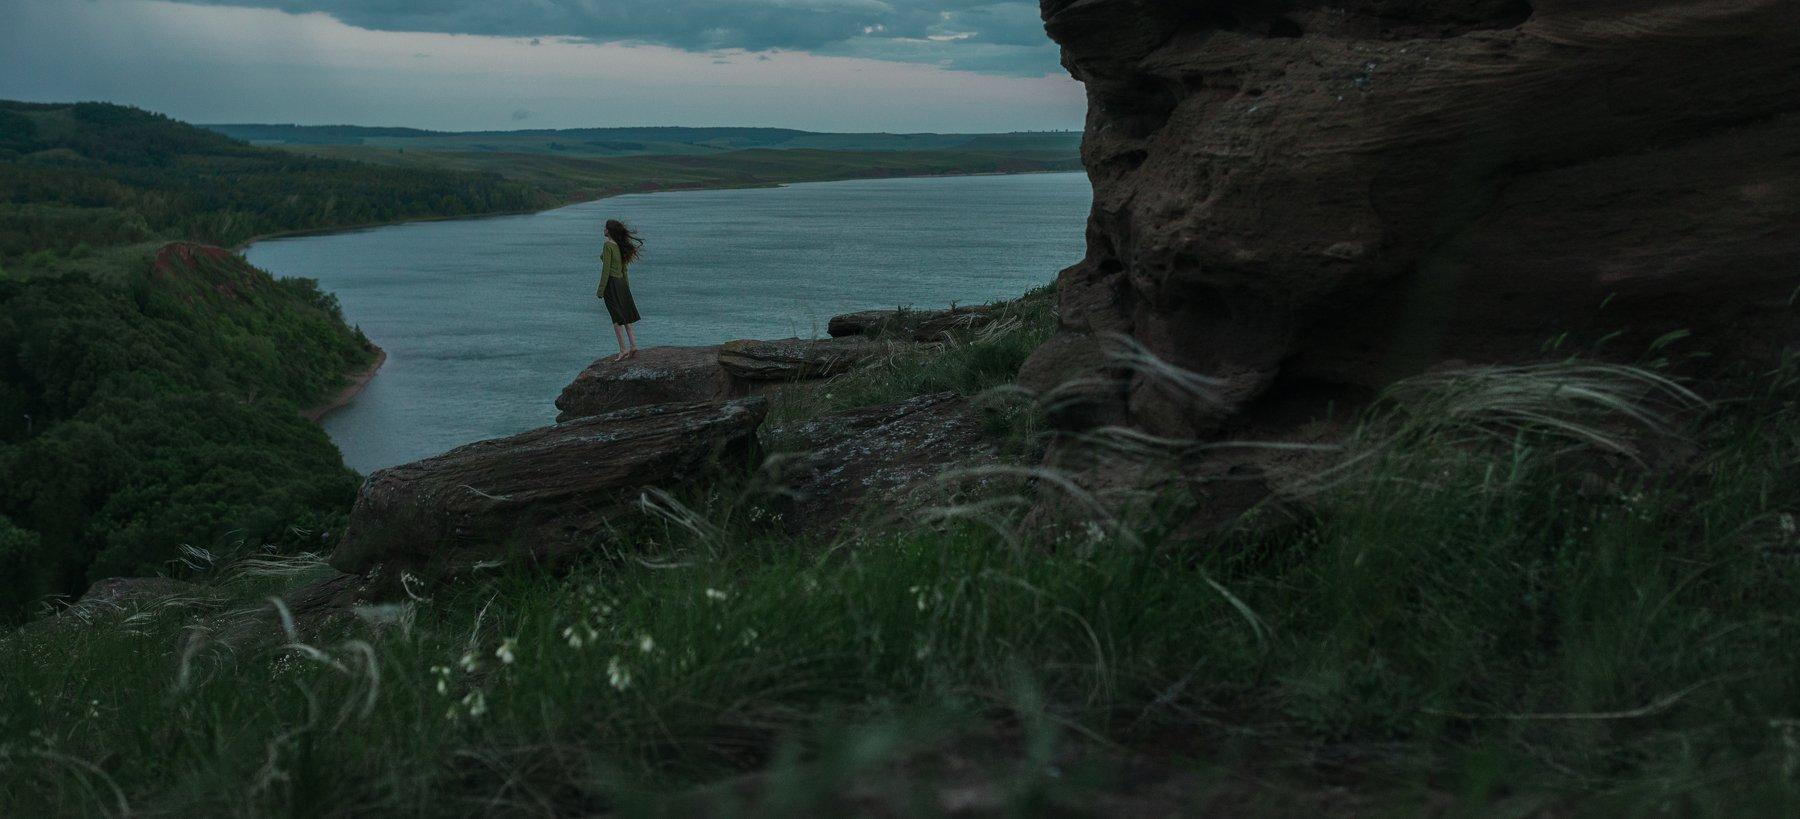 aslikul, nature, lake, bashkortostan, rock, morning, weather, wind, girl, , Роман Филиппов